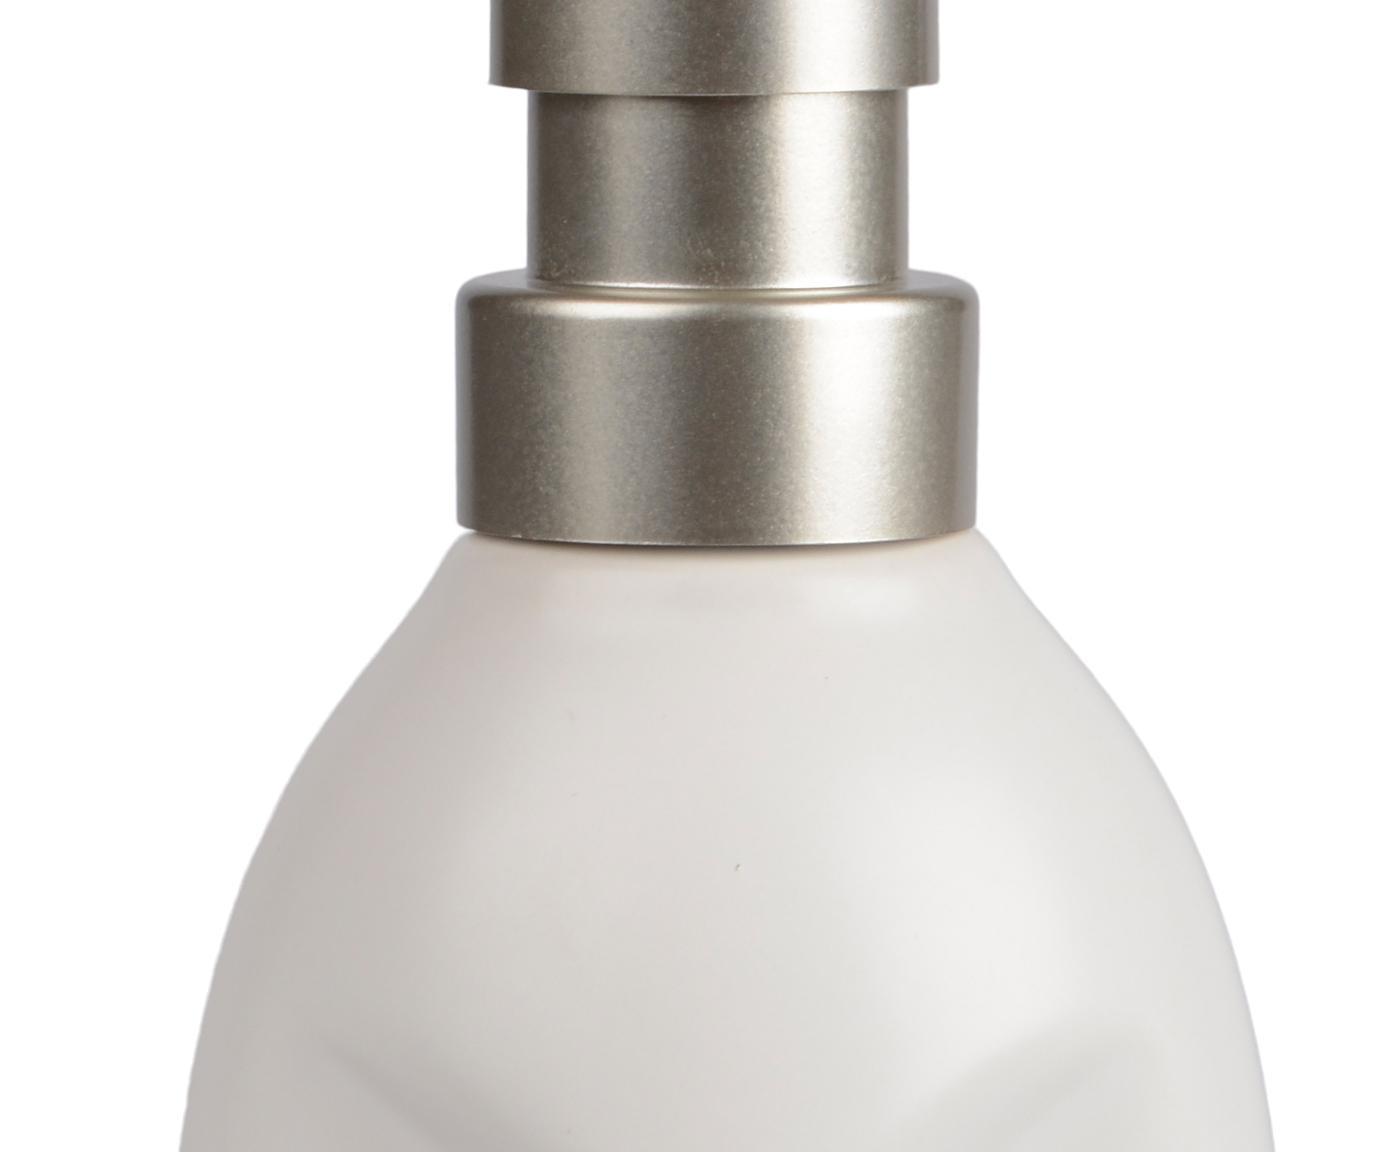 Seifenspender Urban, Behälter: Keramik, Pumpkopf: Kunststoff, Weiß, Metall, Ø 7 x H 19 cm